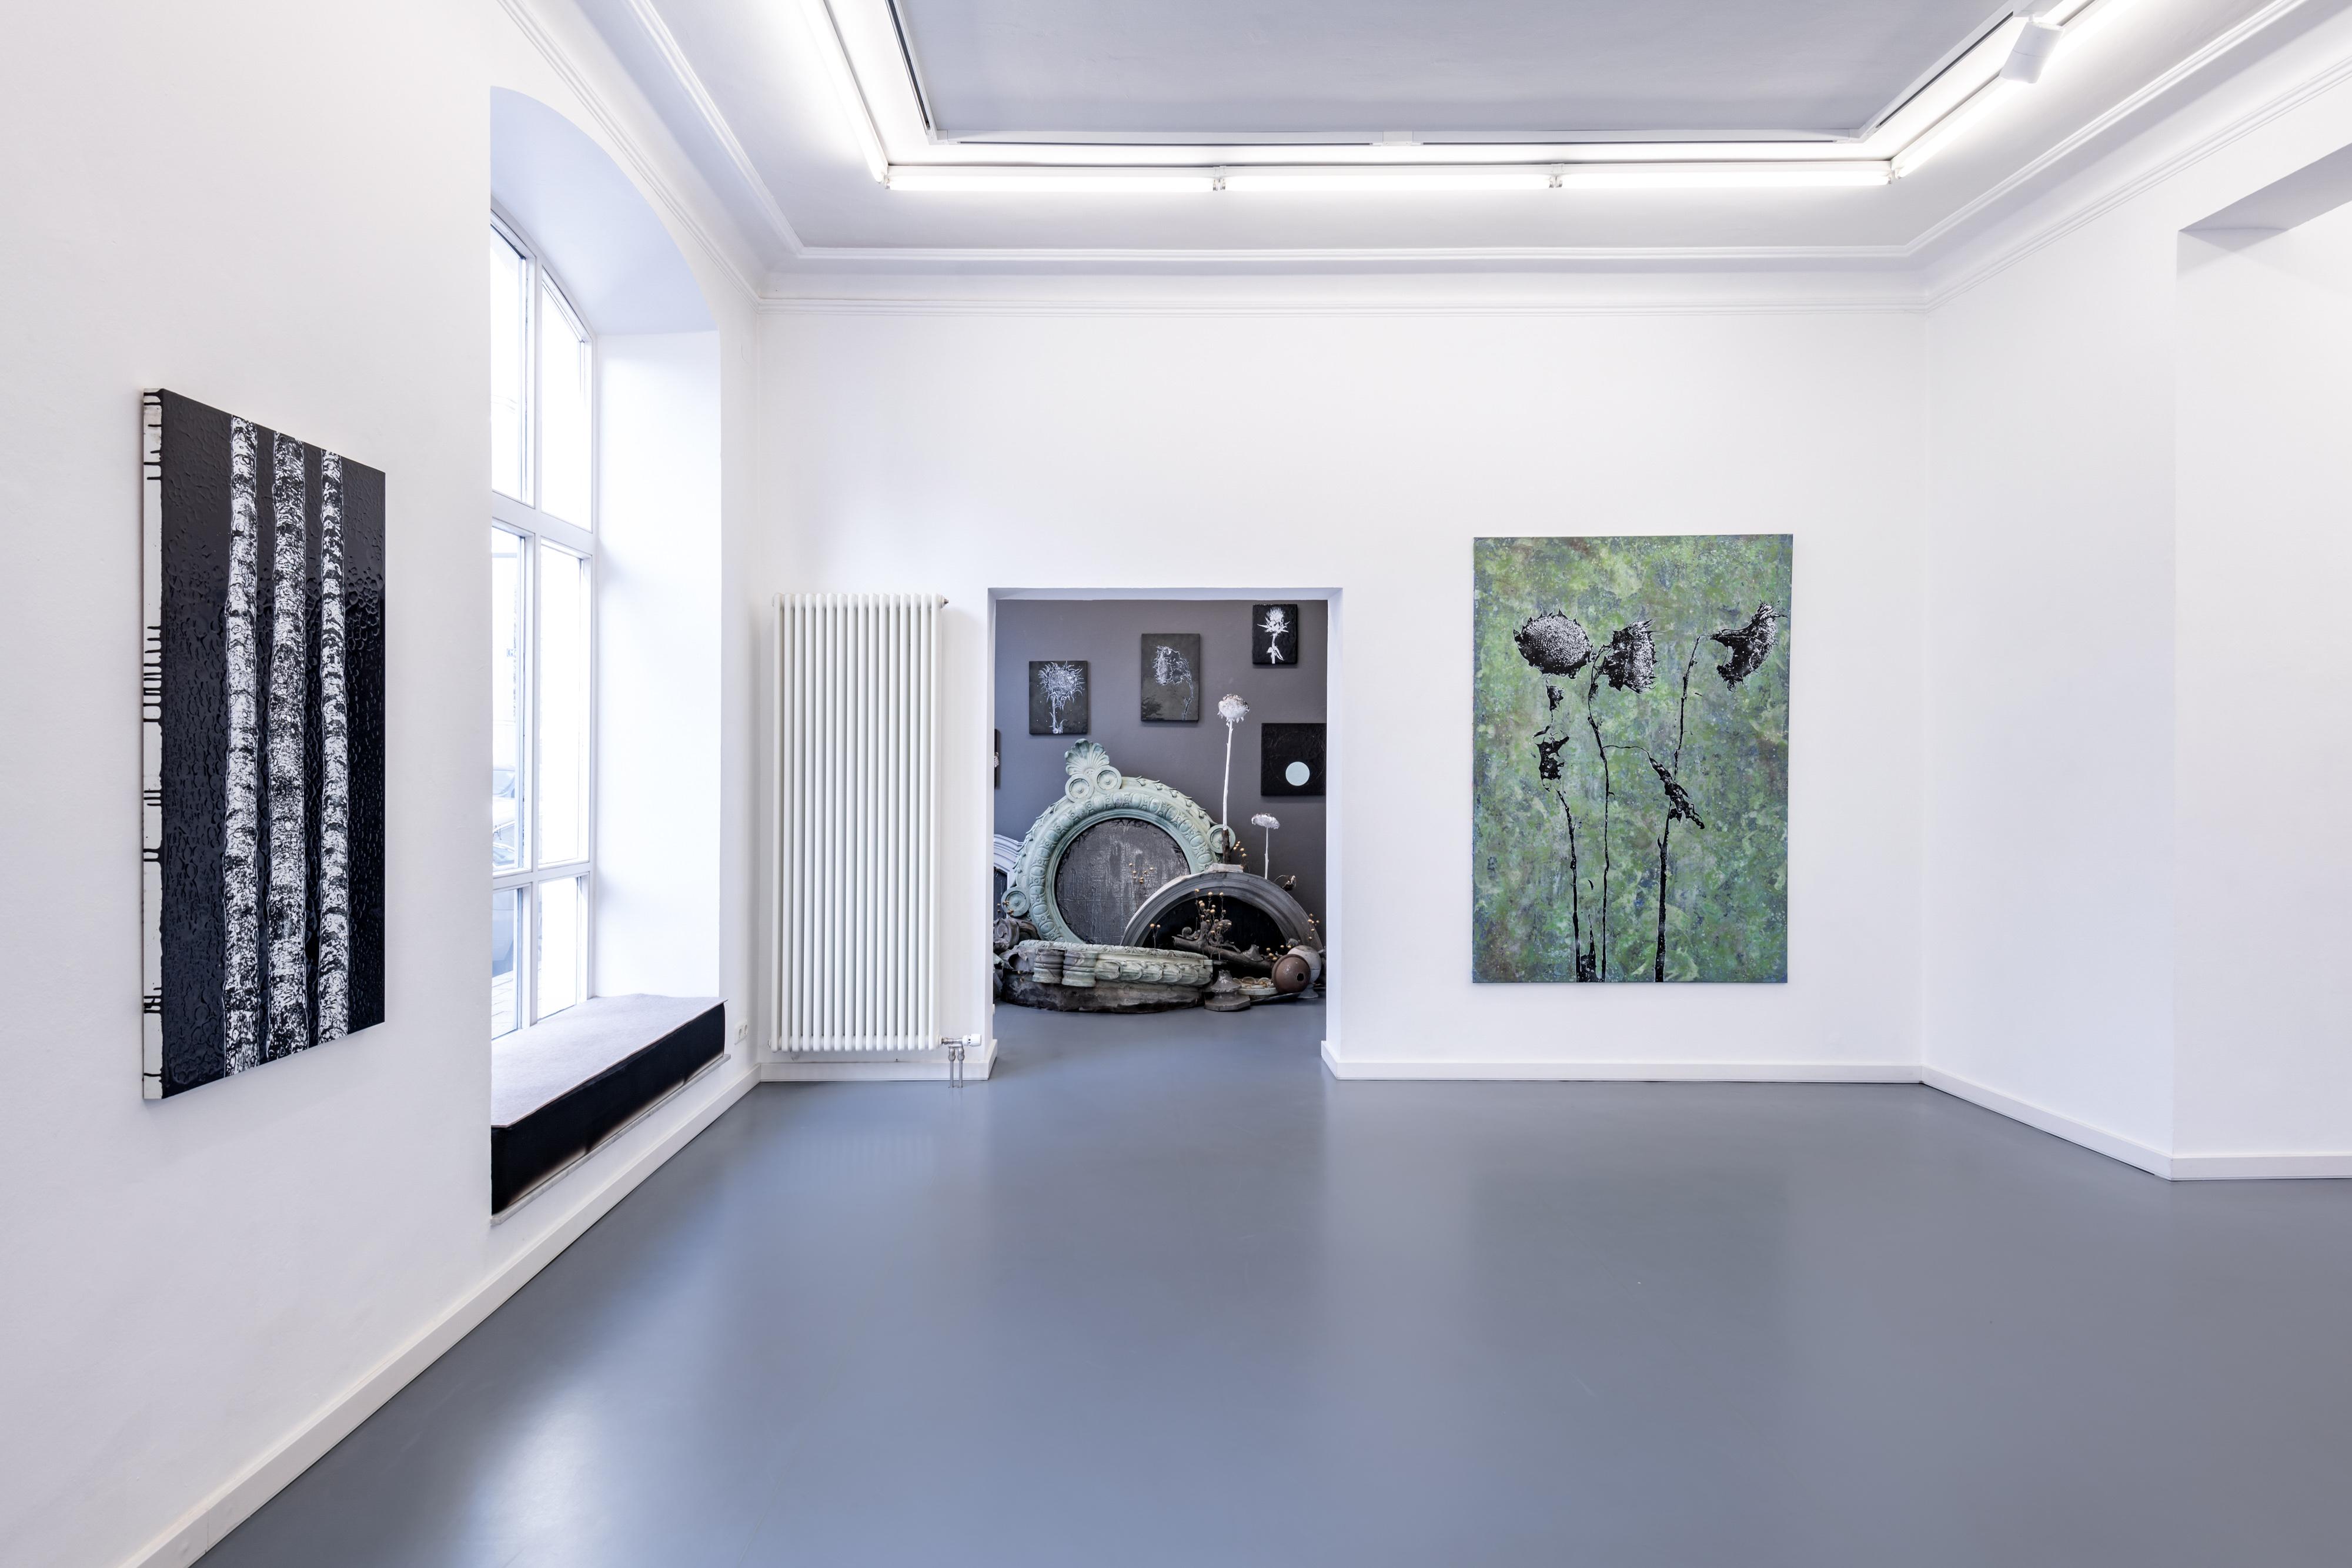 Galerie Andreas Binder 2018